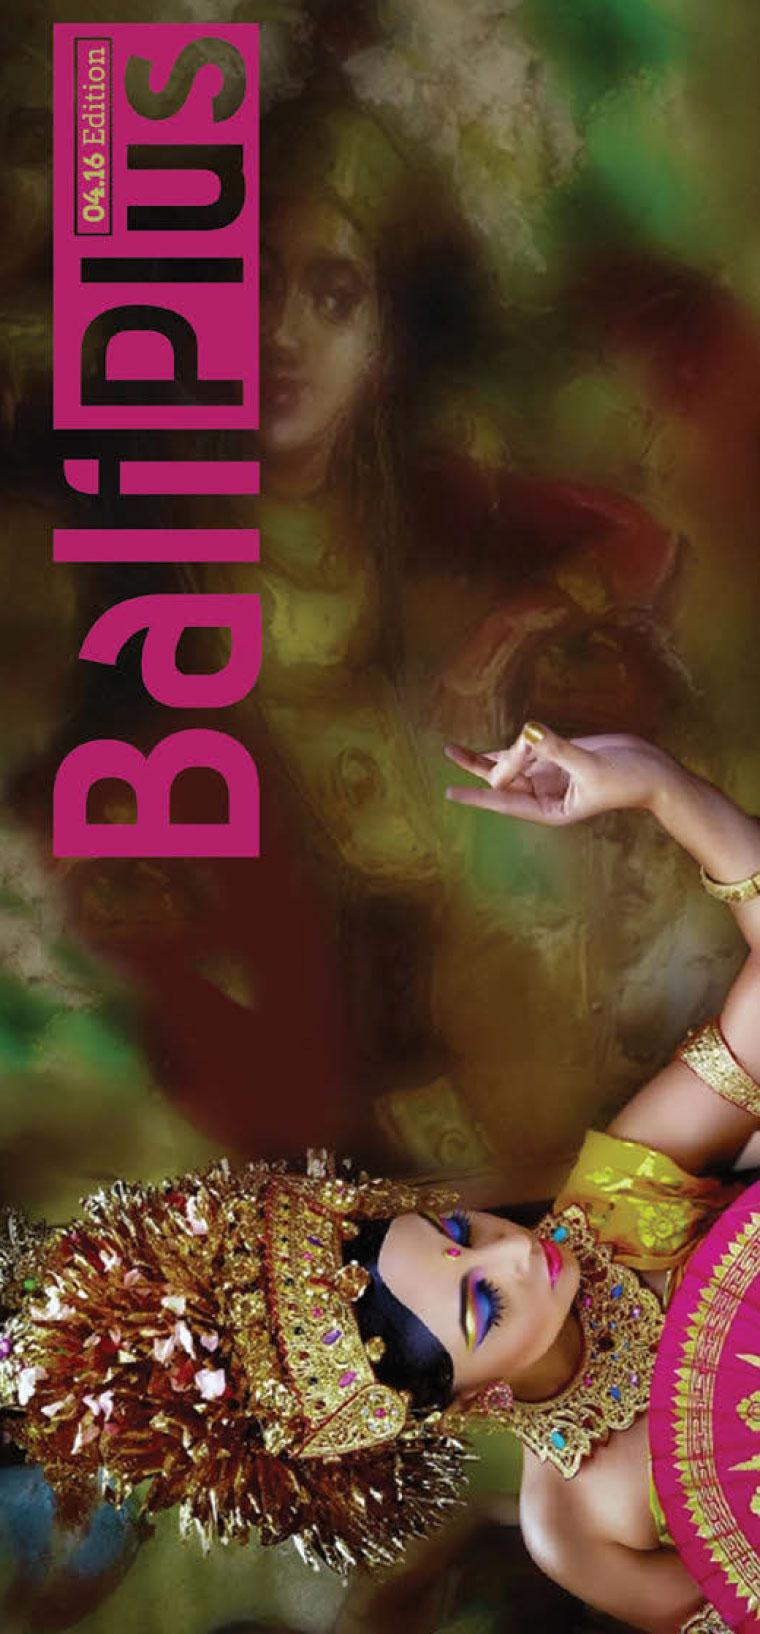 BALI PLUS Digital Magazine April 2016